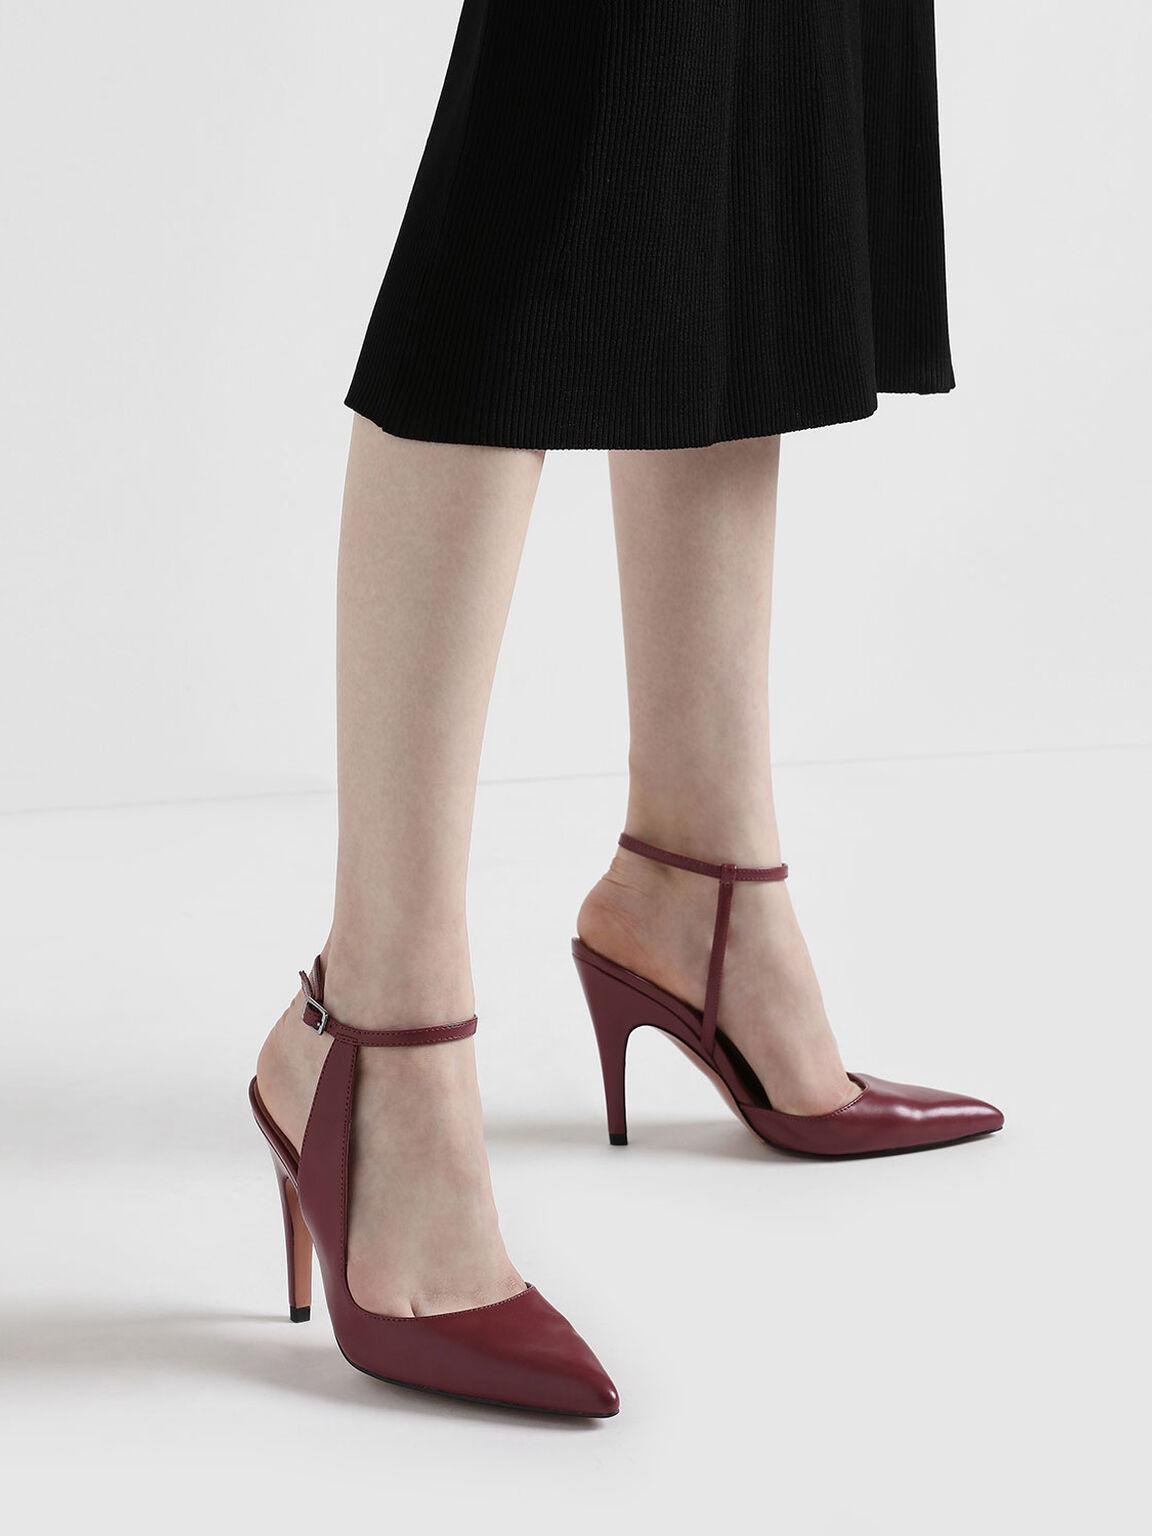 Side Strap Pointed Stiletto Heels, Pink, hi-res